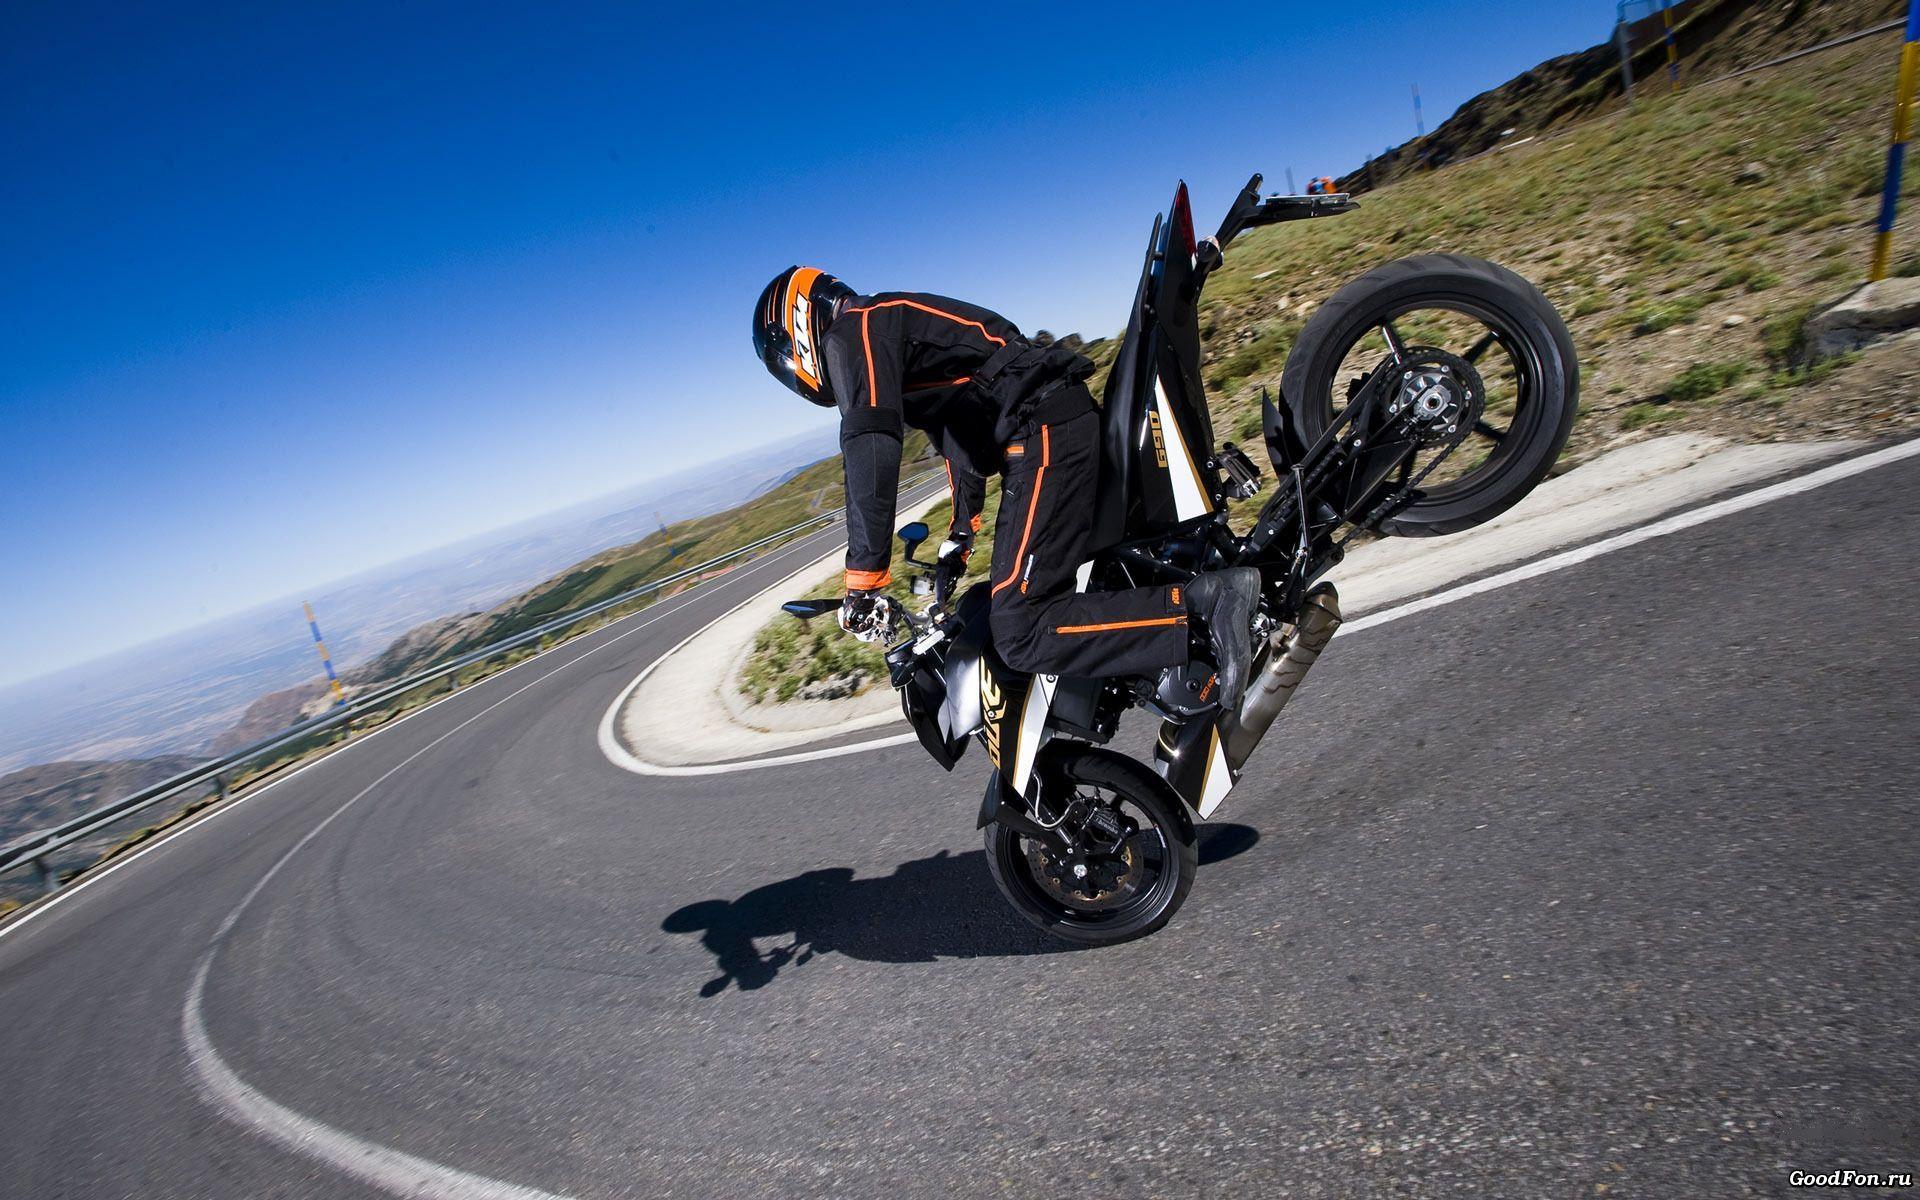 Supermoto ktm 690 stunt concept bikemotorcycletuned car tuning car - Ktm 690 Duke Stoppie Bikes Hd Wallpapers For Desktop